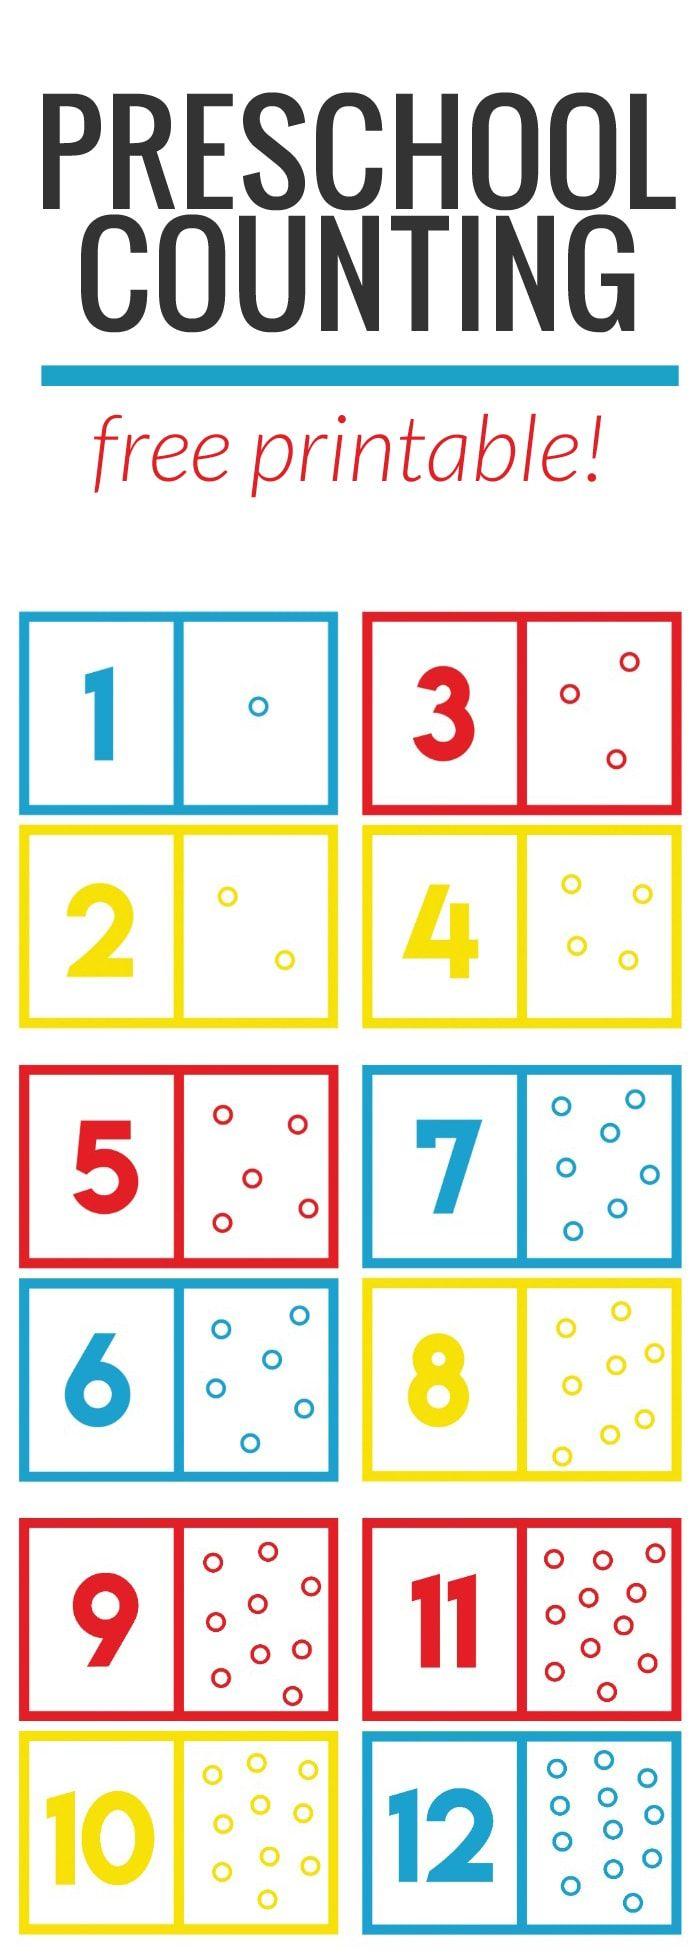 Preschool Math Counting Game + Free Printable!